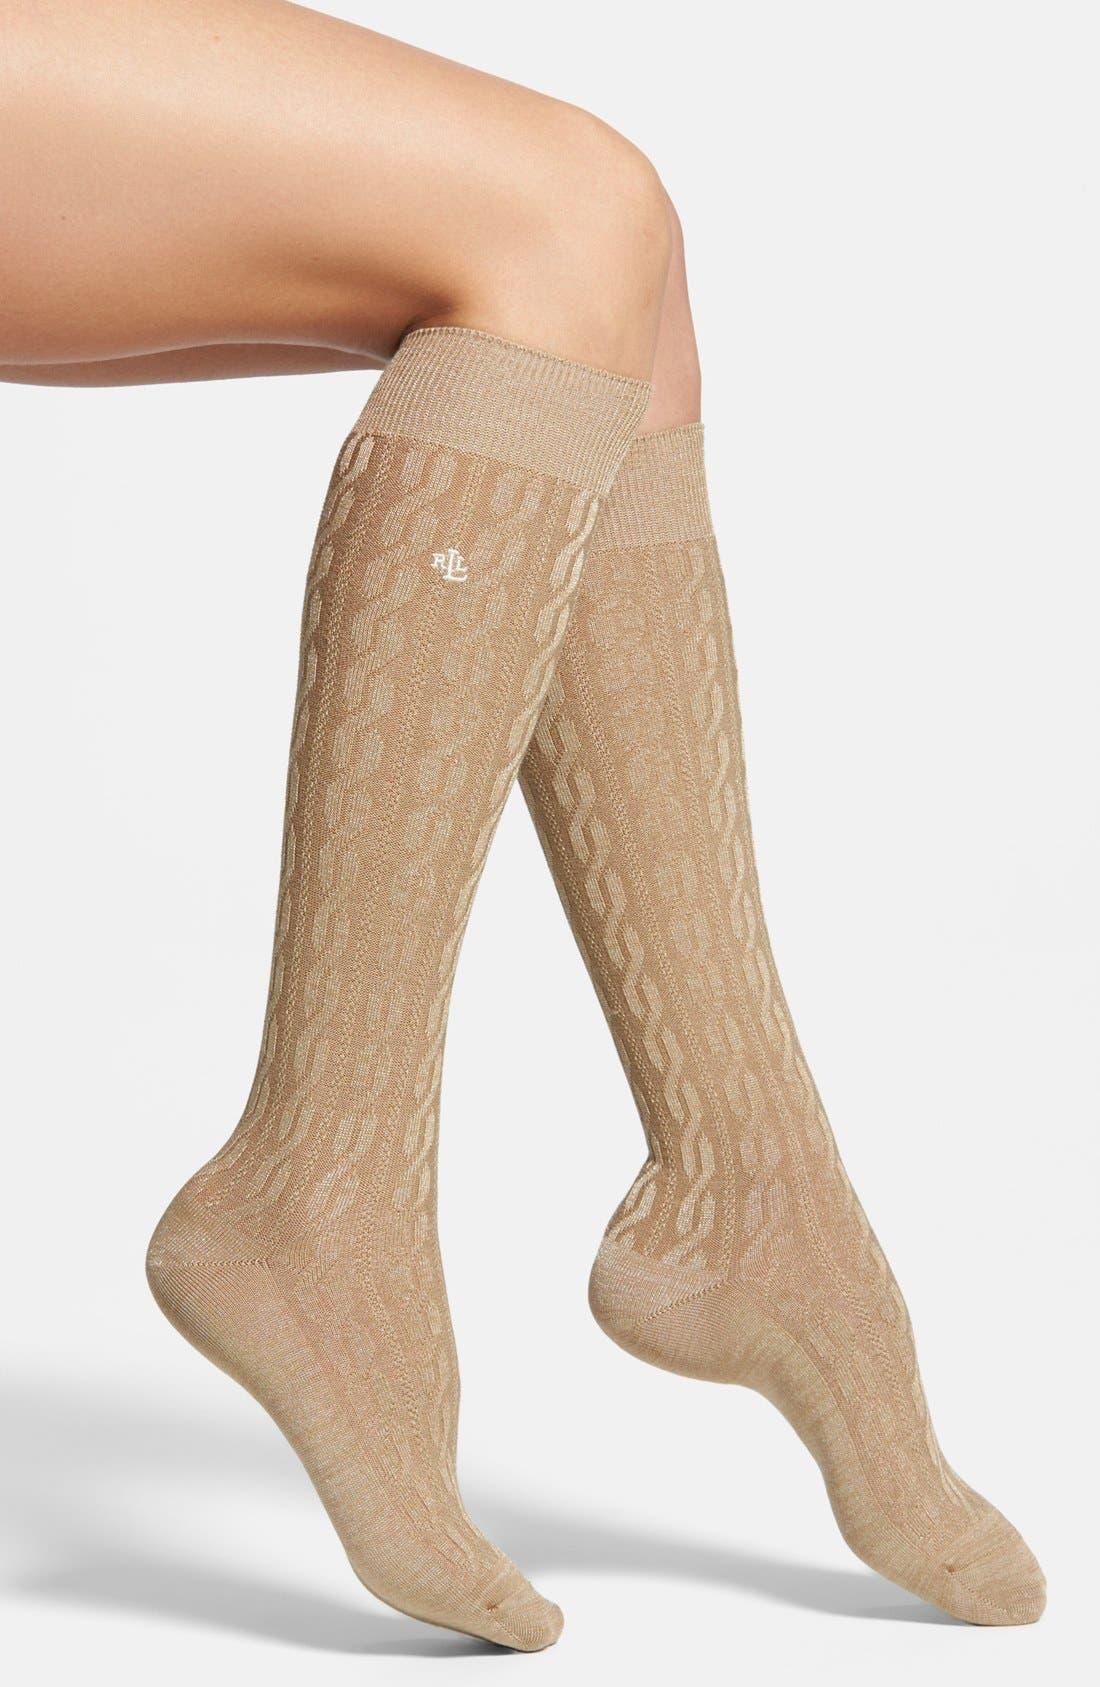 Main Image - Ralph Lauren Cable Knit Knee High Socks